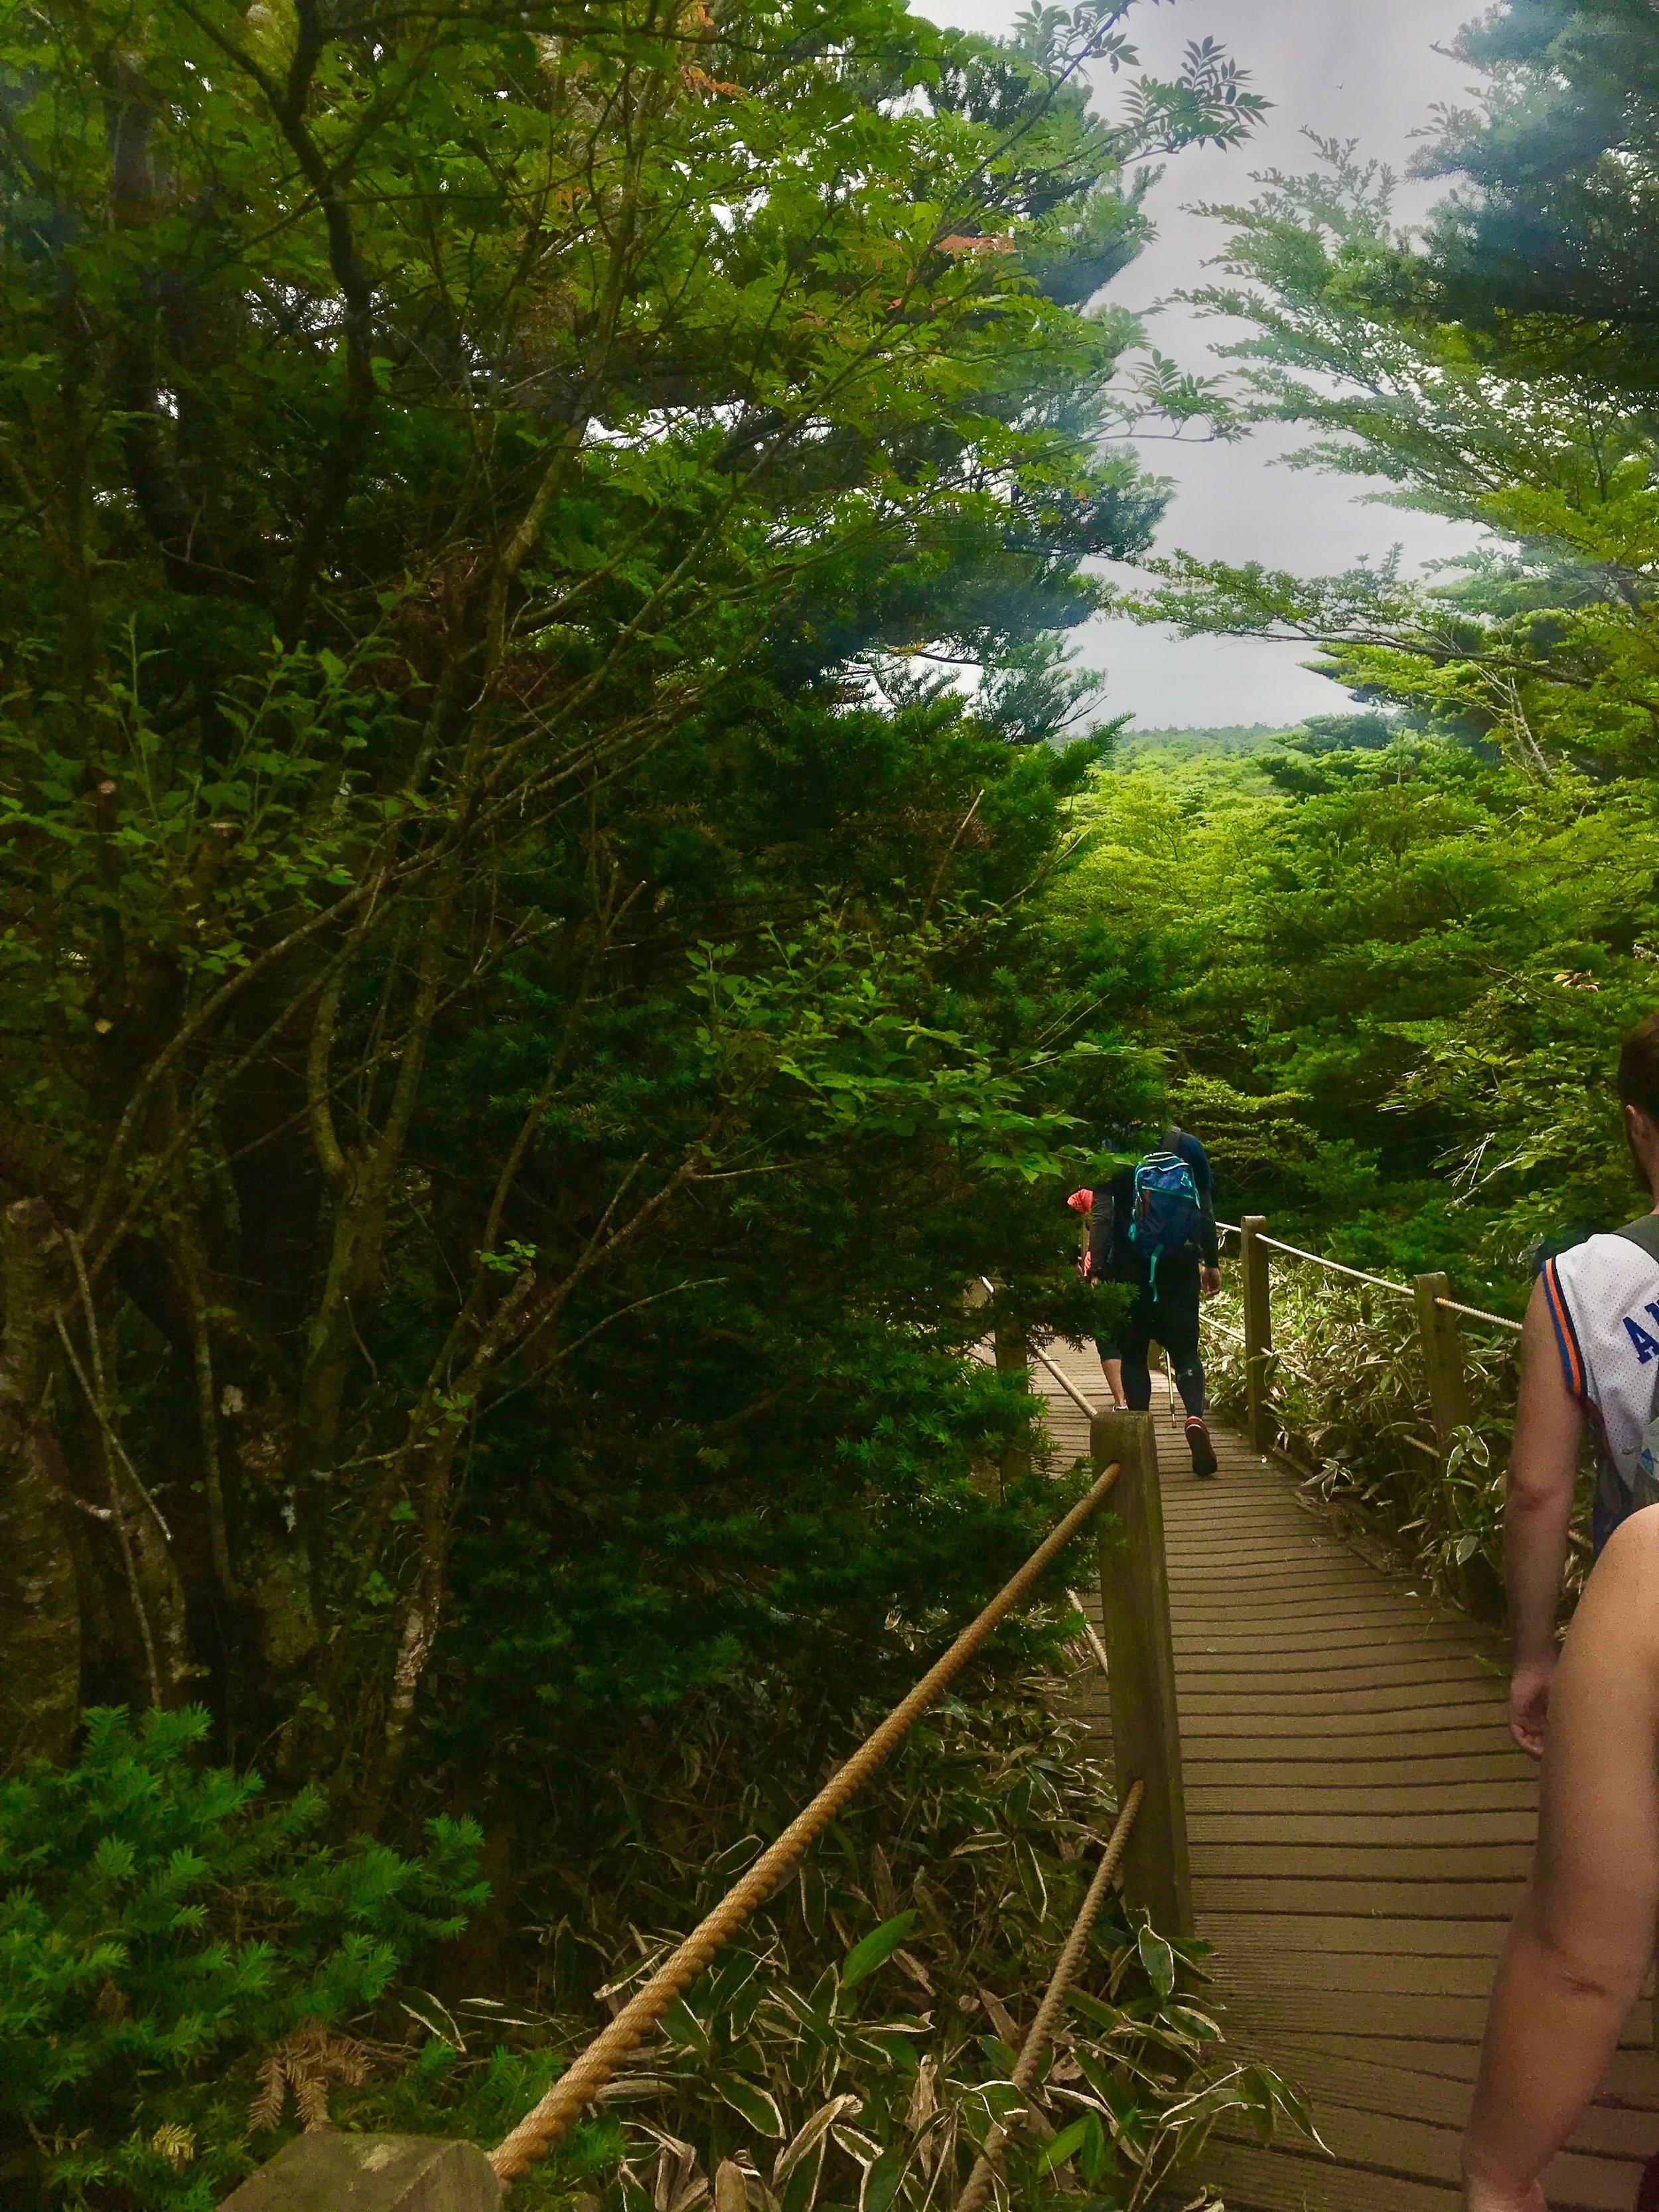 Seongpanak trail - Seongpanak trail